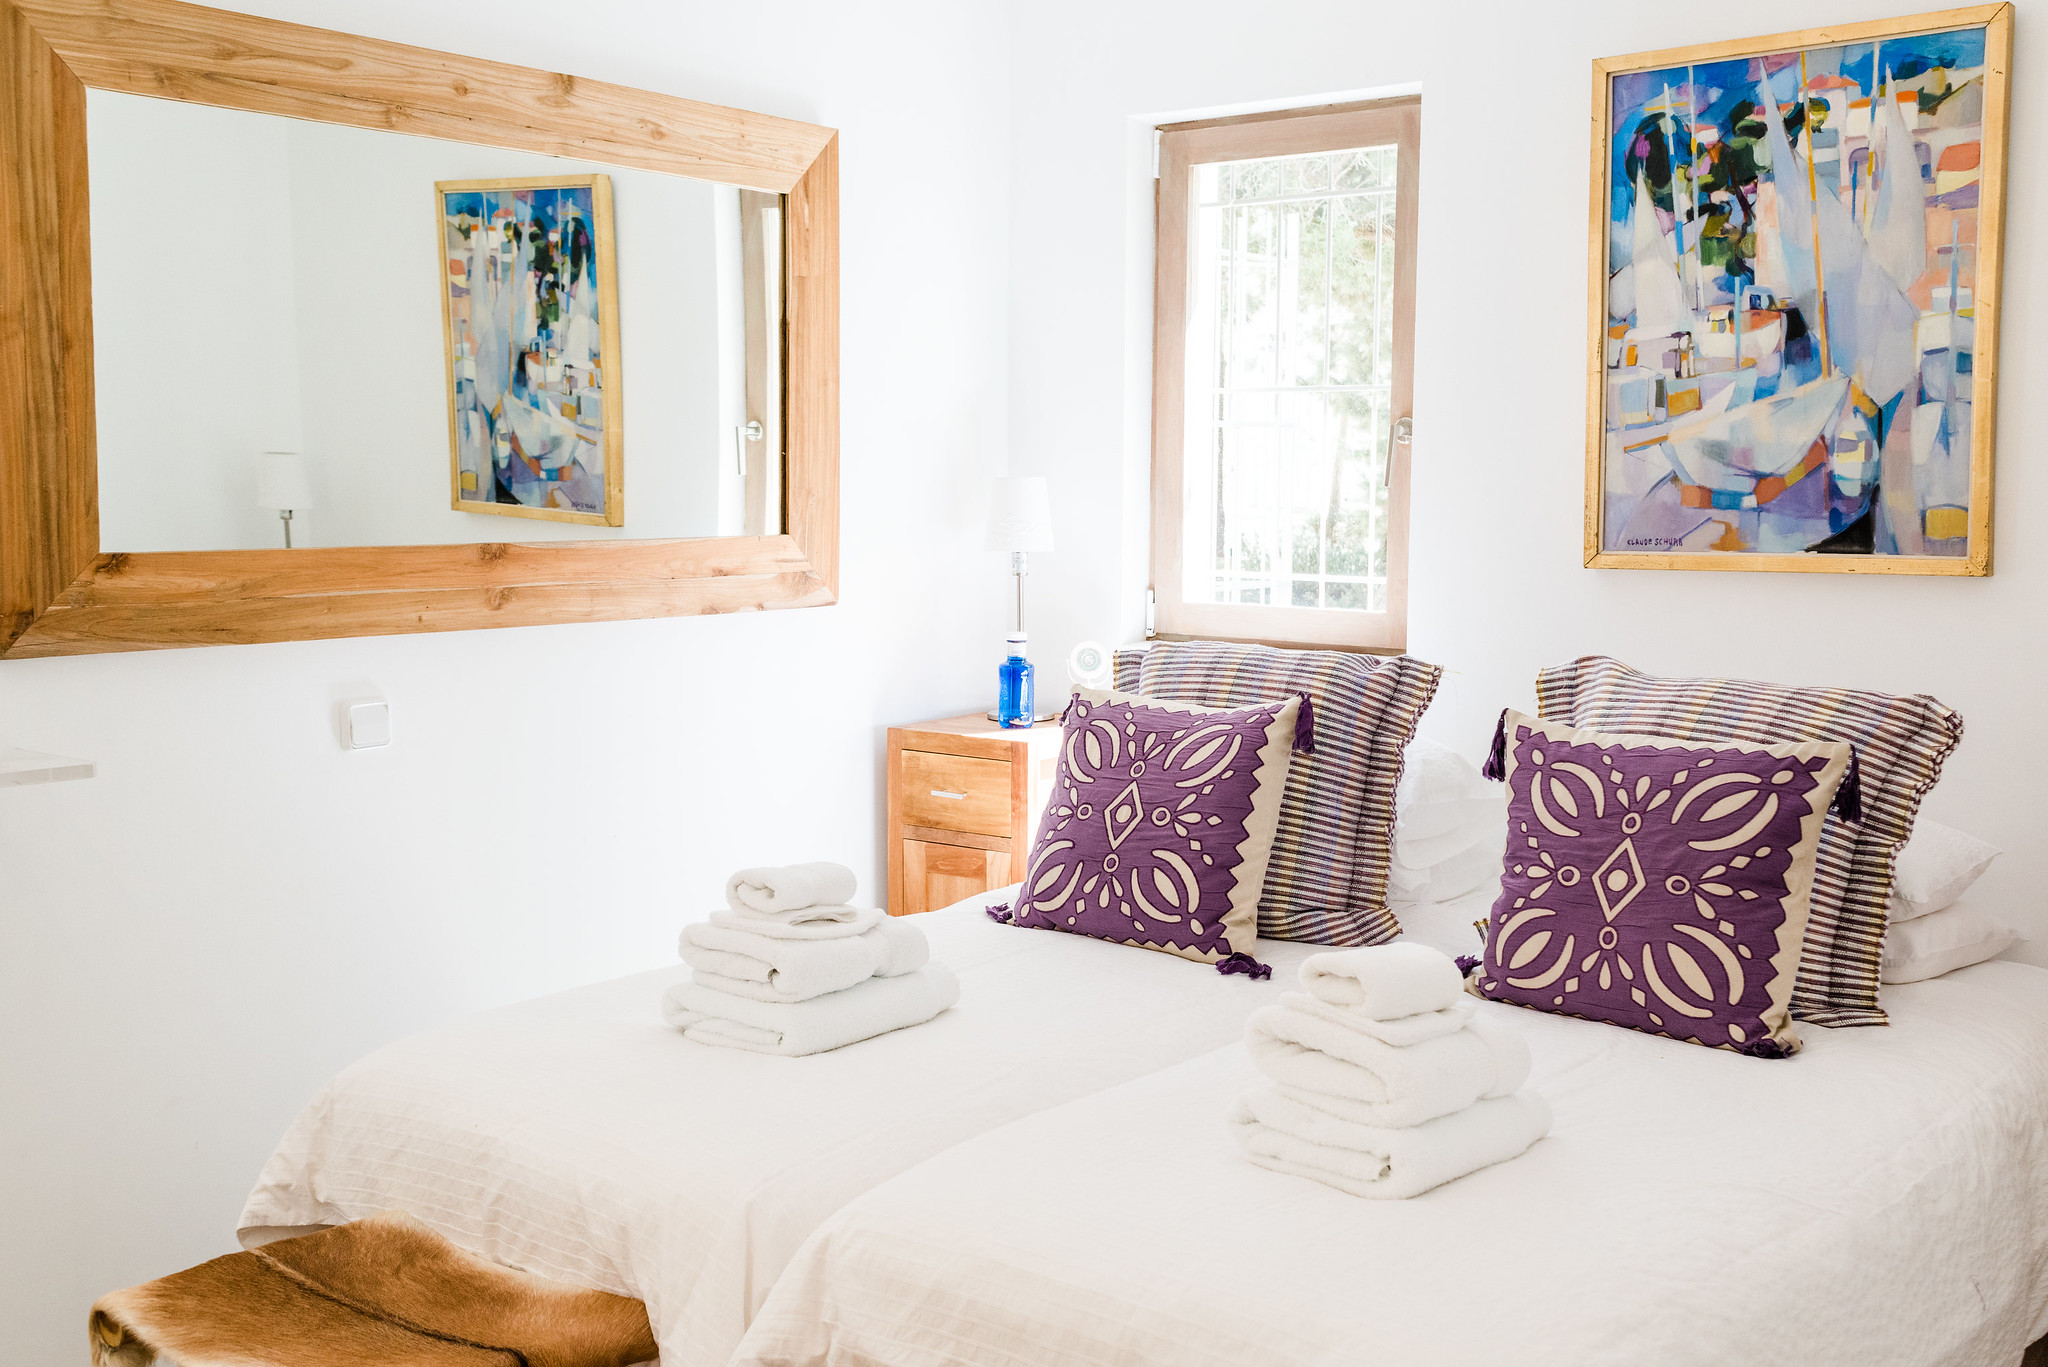 https://www.white-ibiza.com/wp-content/uploads/2020/06/white-ibiza-villas-casa-nyah-interior-bedroom6.jpg